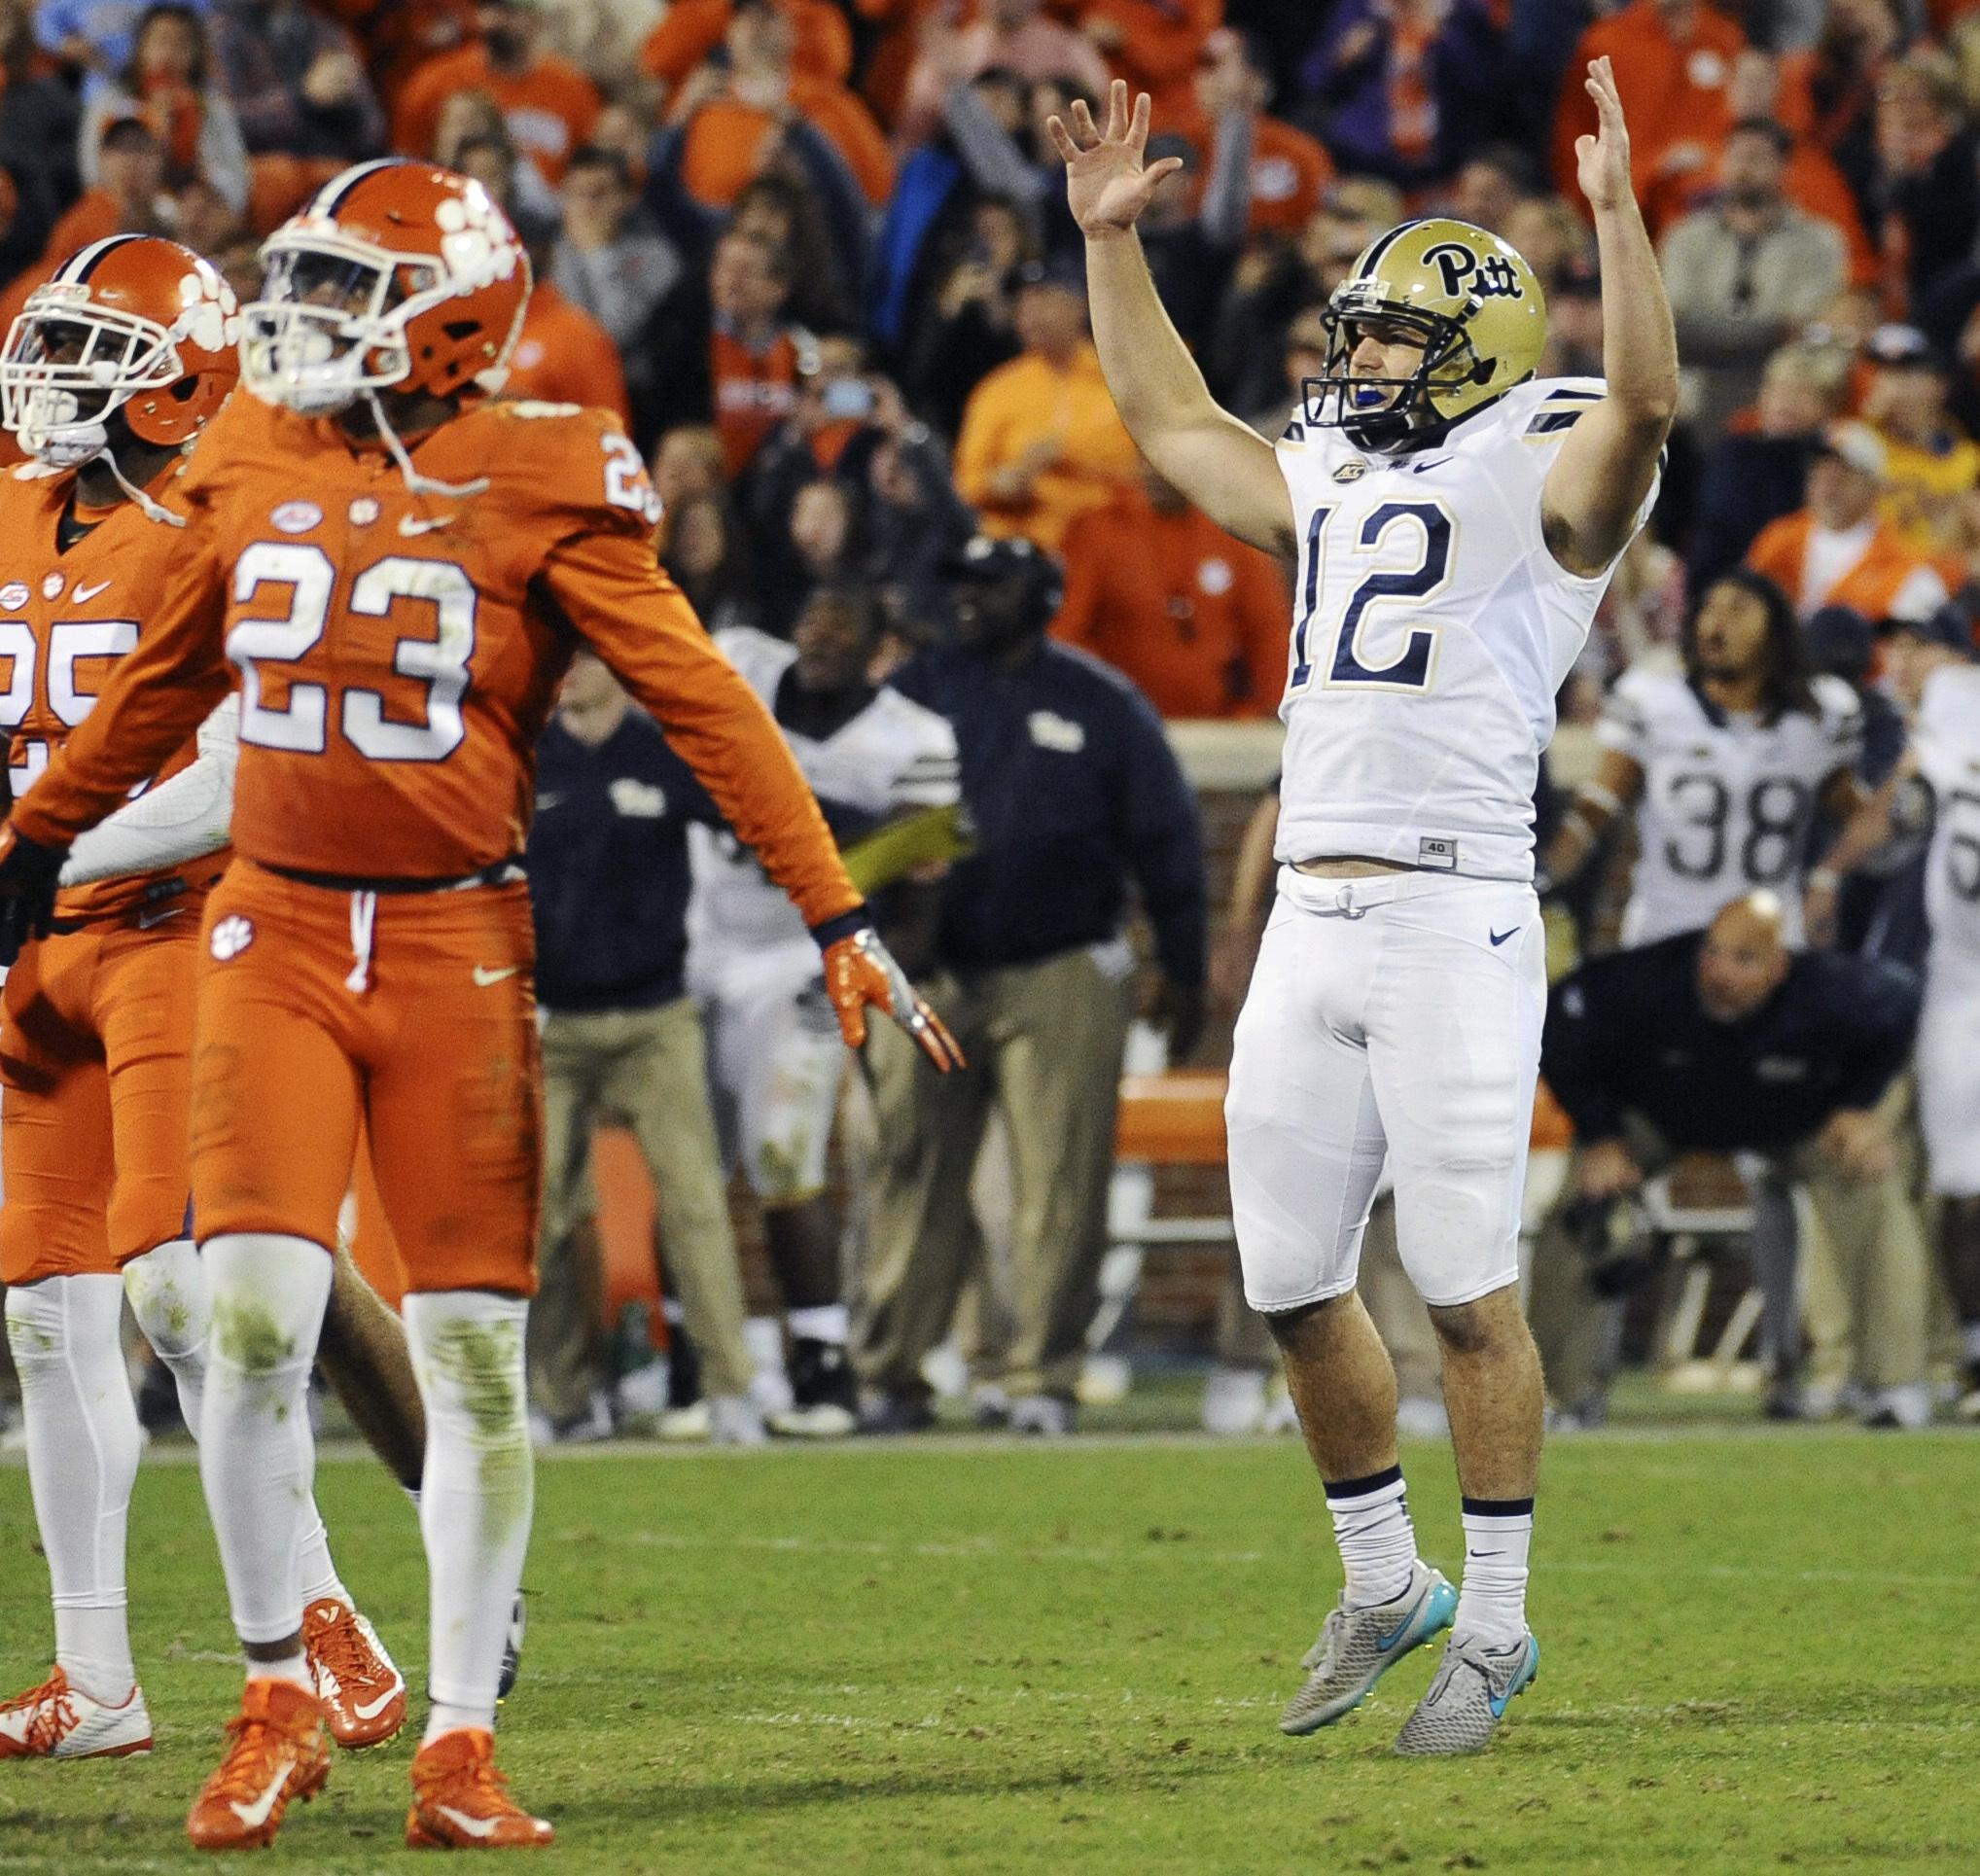 Pittsburgh place kicker Chris Blewitt (12) celebrates after kicking the game-winning field goal in an NCAA college football game against Clemson on Saturday, Nov. 12, 2016, in Clemson, S.C. Pittsburgh won 43-42. (AP Photo/Rainier Ehrhardt)